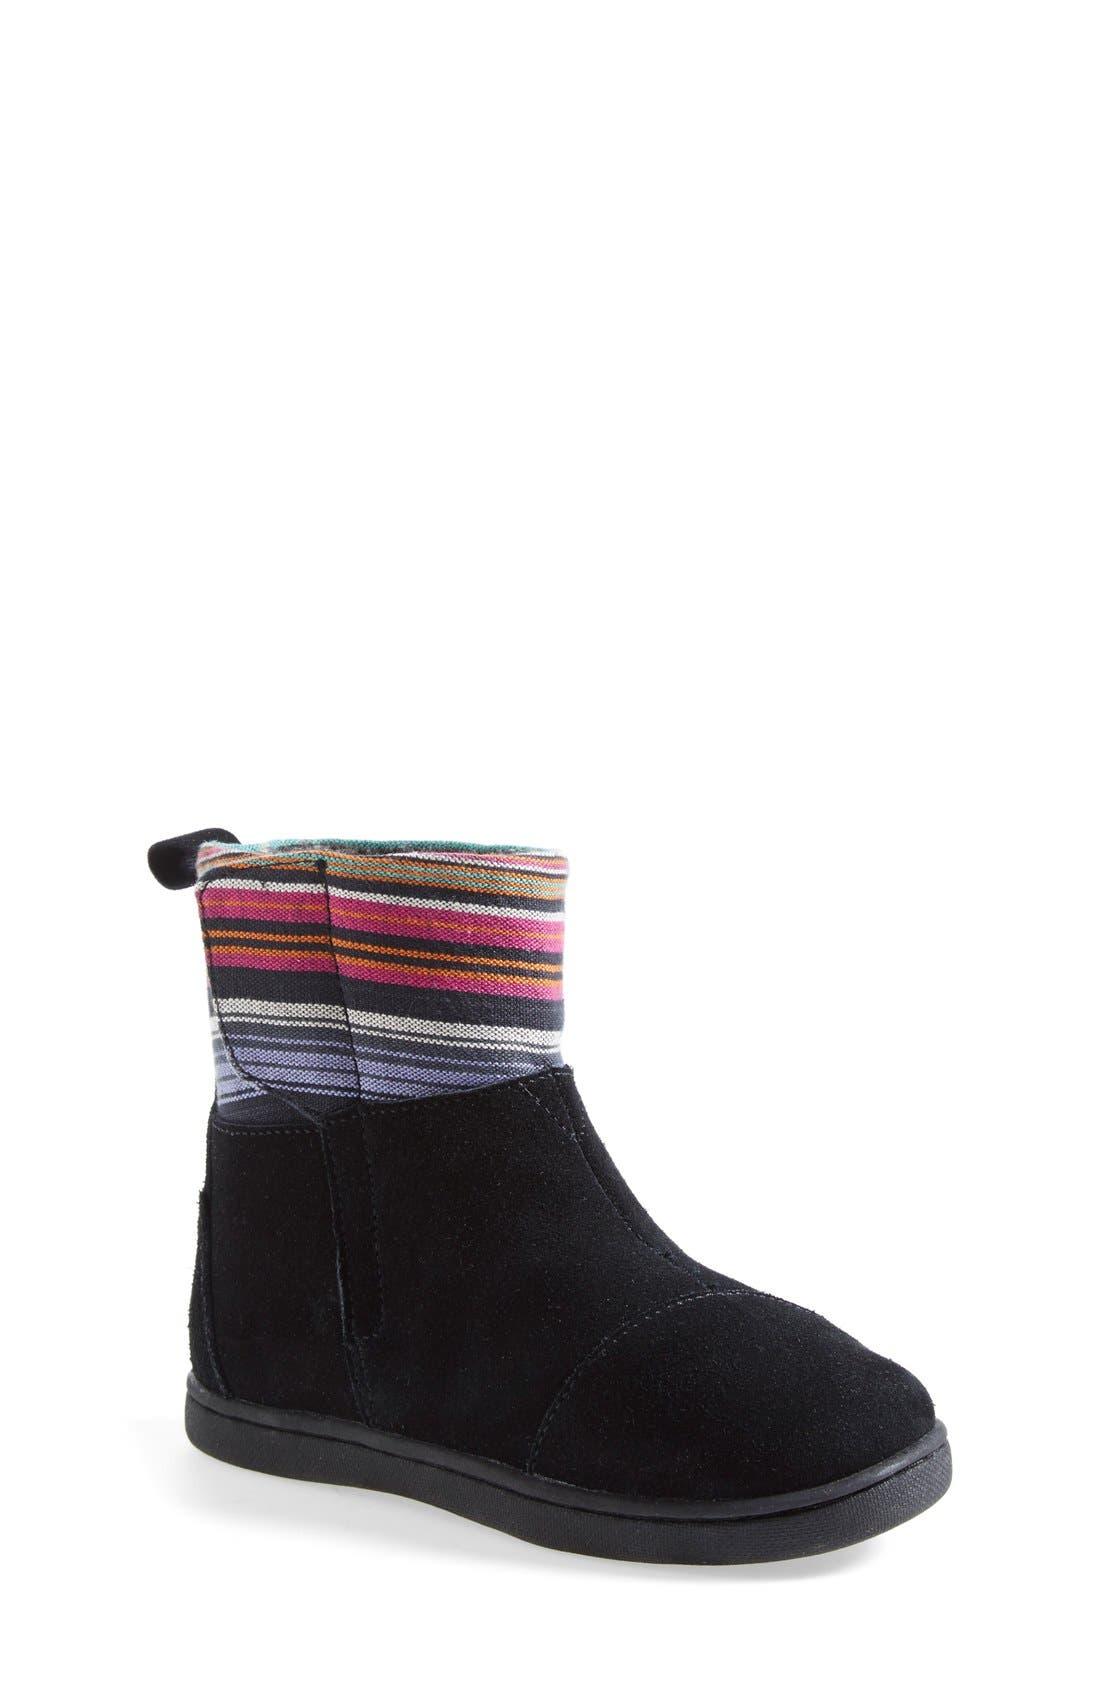 Main Image - TOMS 'Nepal - Tiny' Boot (Toddler)